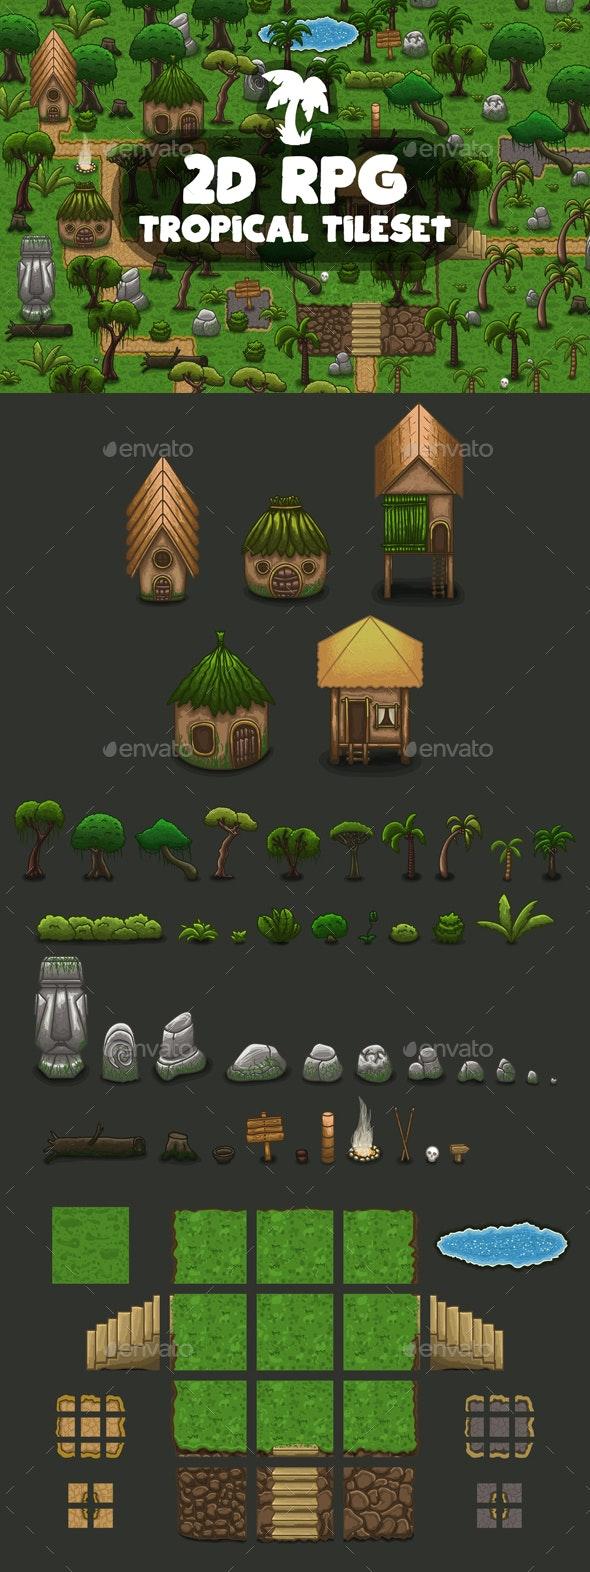 RPG Tropical Tileset - Tilesets Game Assets